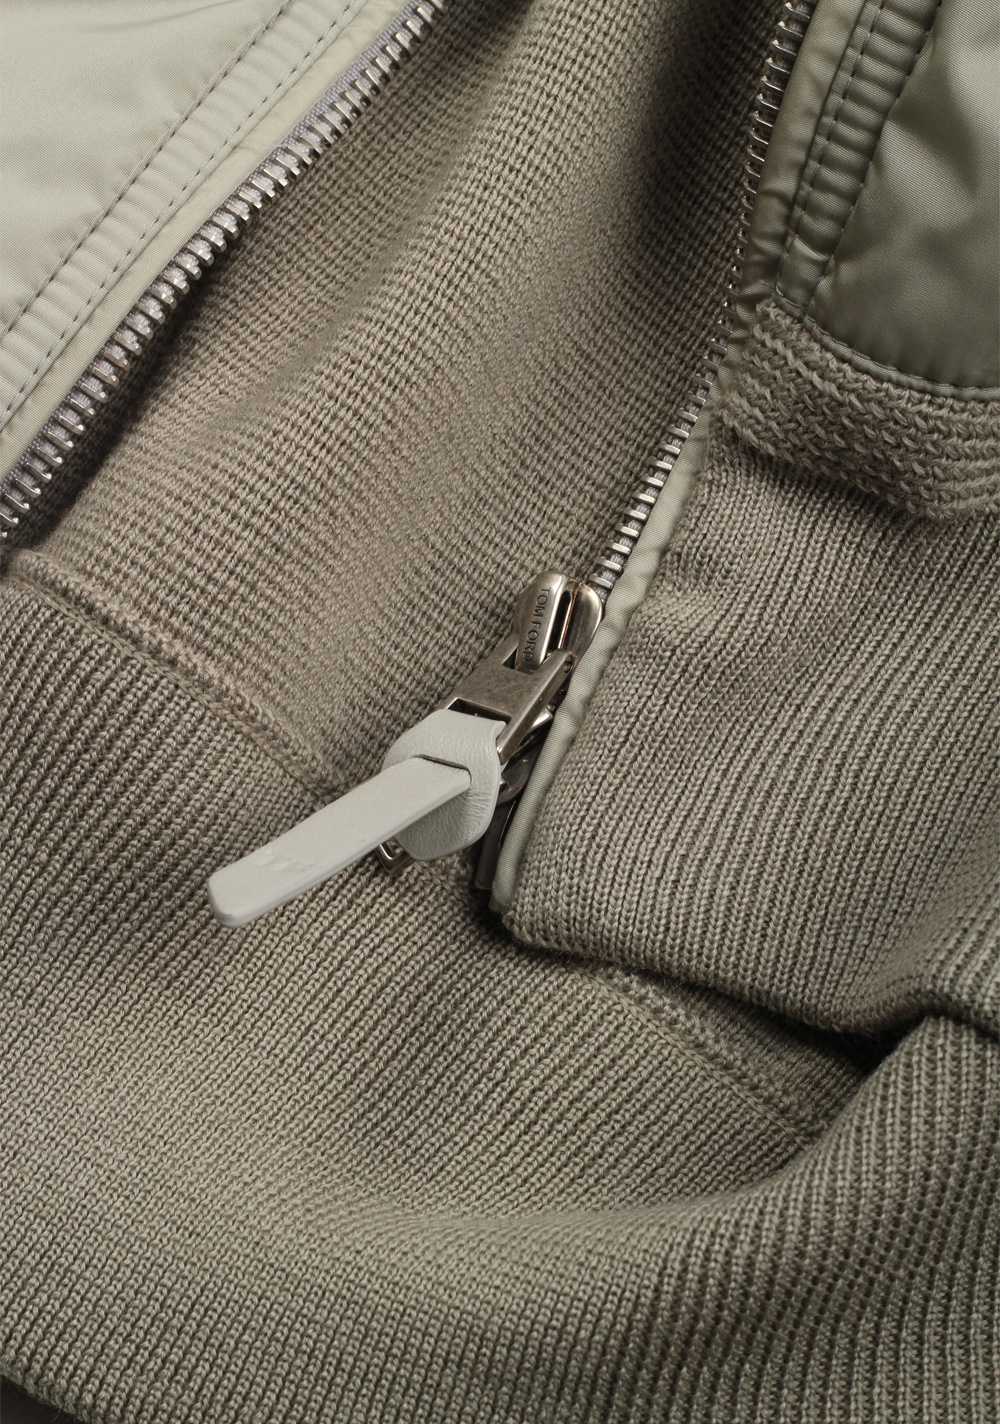 TOM FORD Beige 2020 James Bond Spectre Bomber Jacket   Costume Limité